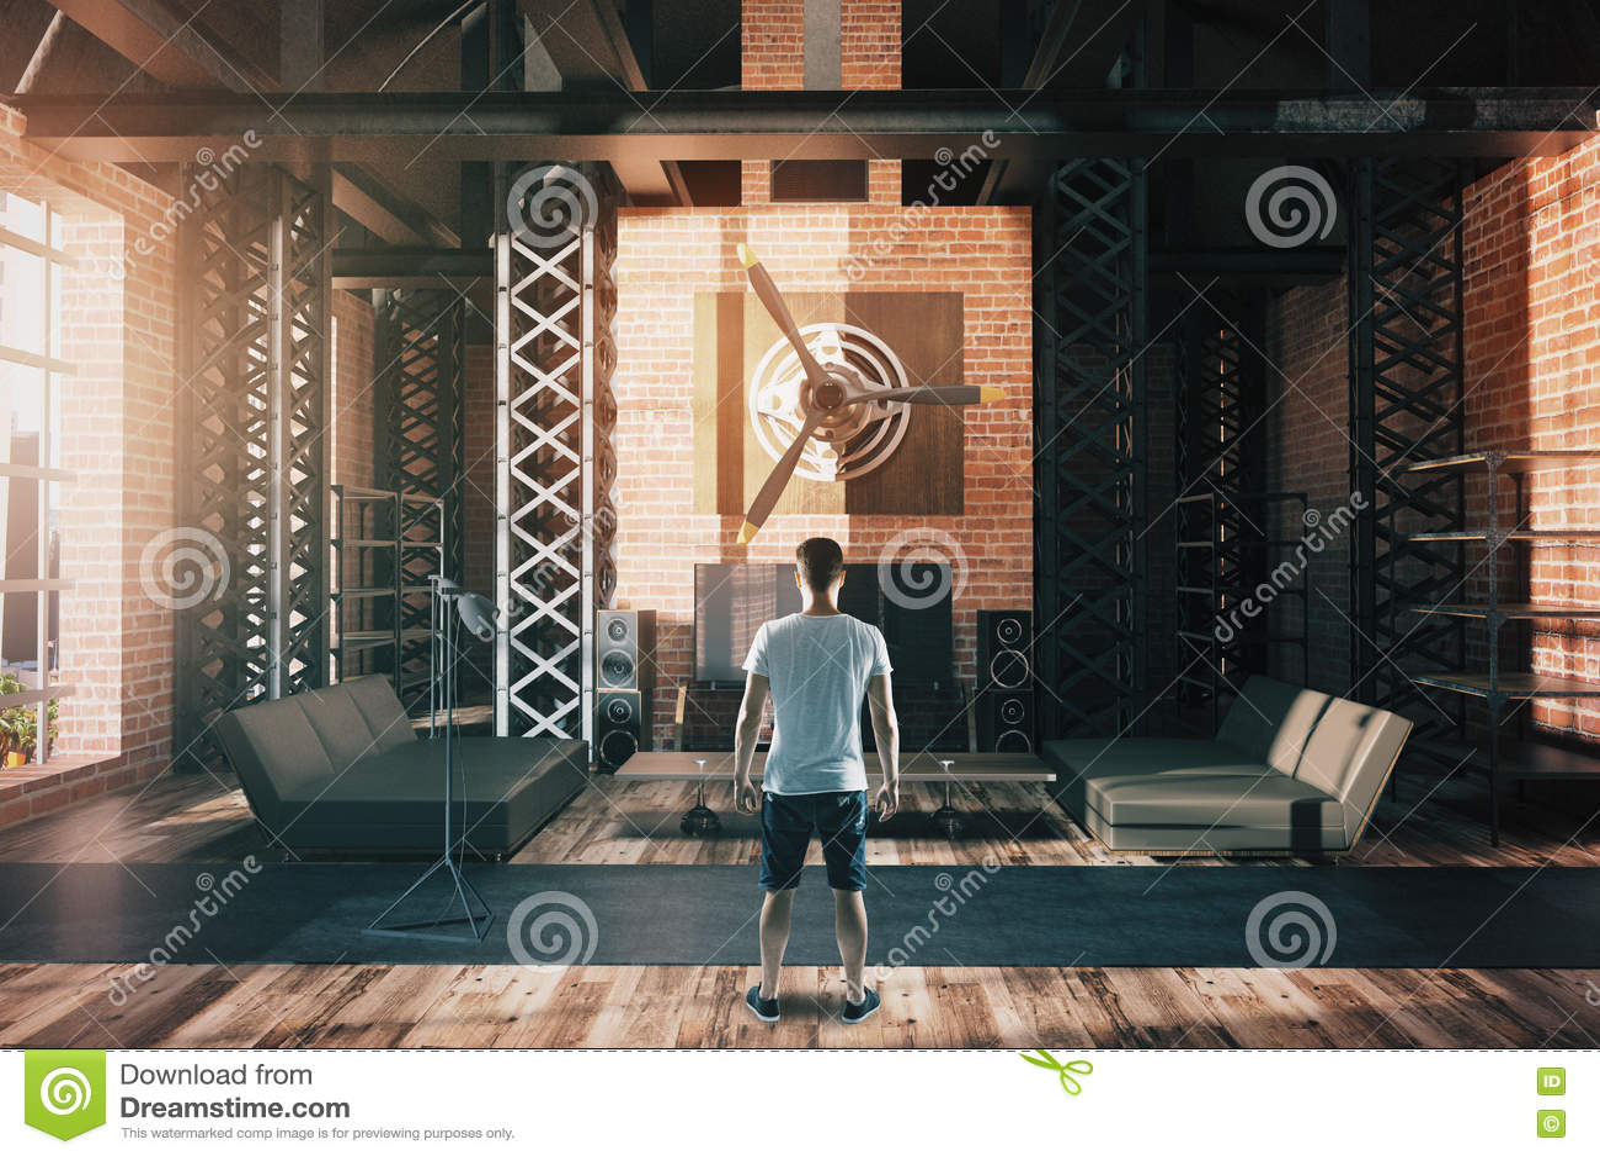 Man in hangar style interior